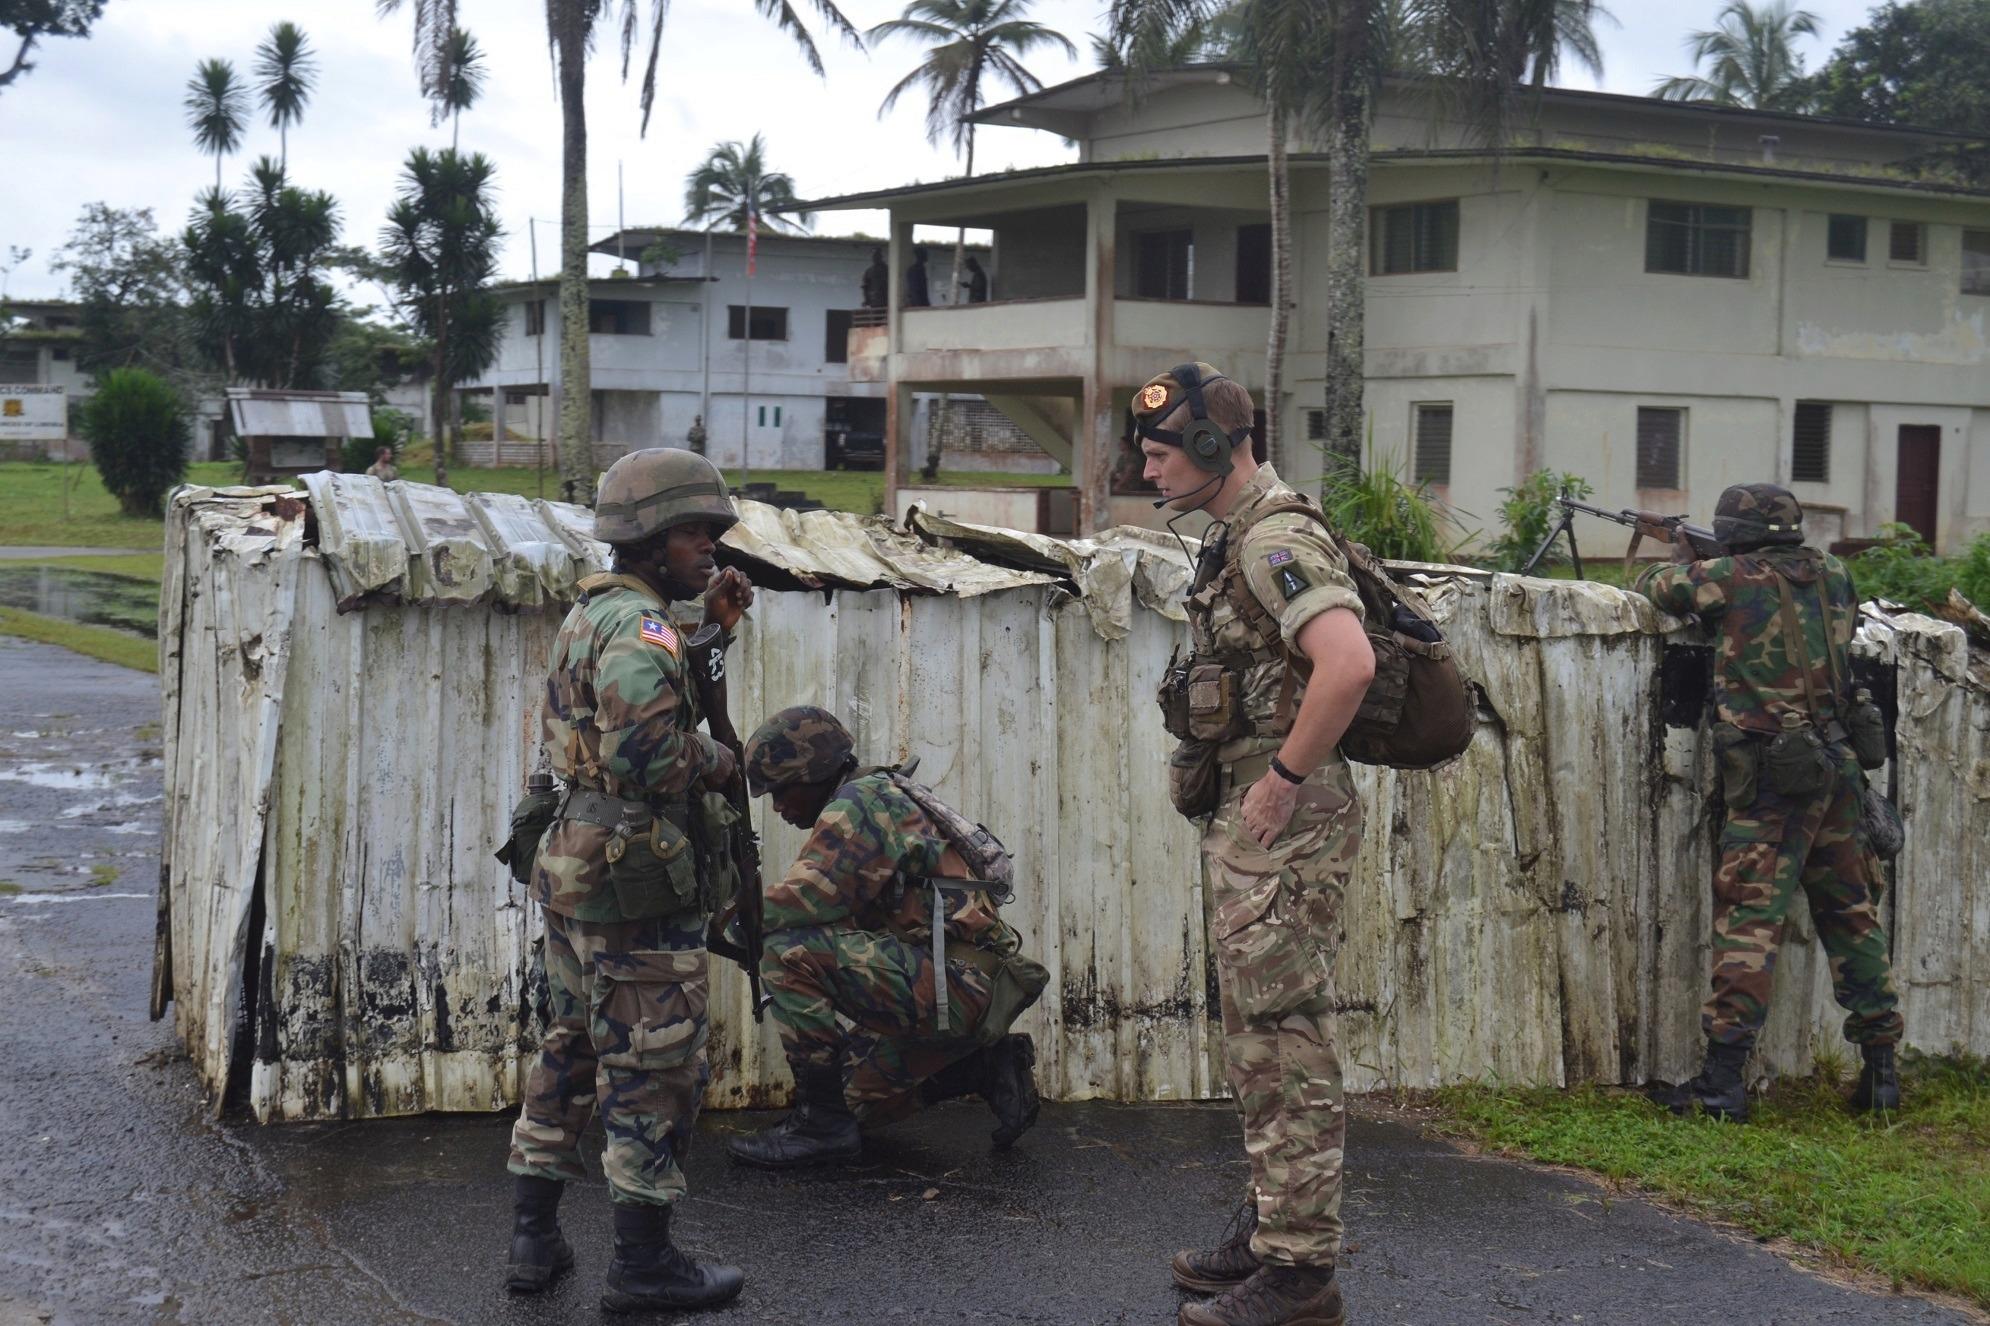 Les Forces Armées du Libéria / Armed Forces of Liberia ( AFL ) _12f58